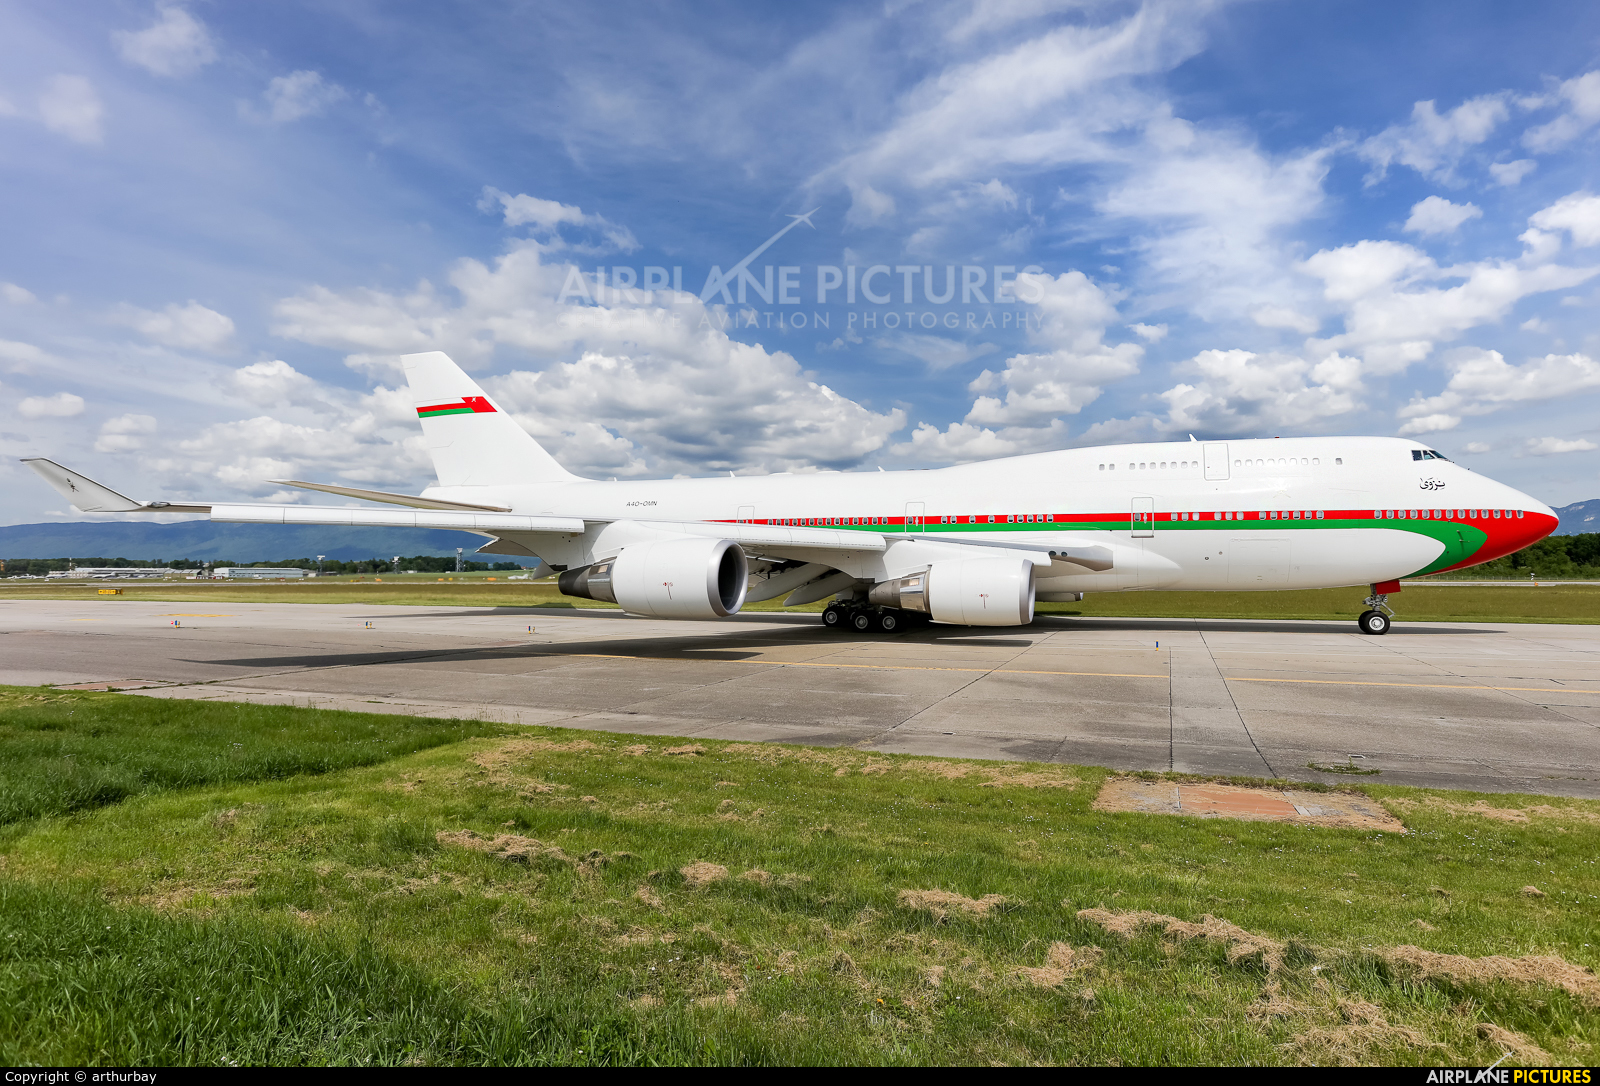 Oman - Royal Flight A4O-OMN aircraft at Geneva Intl